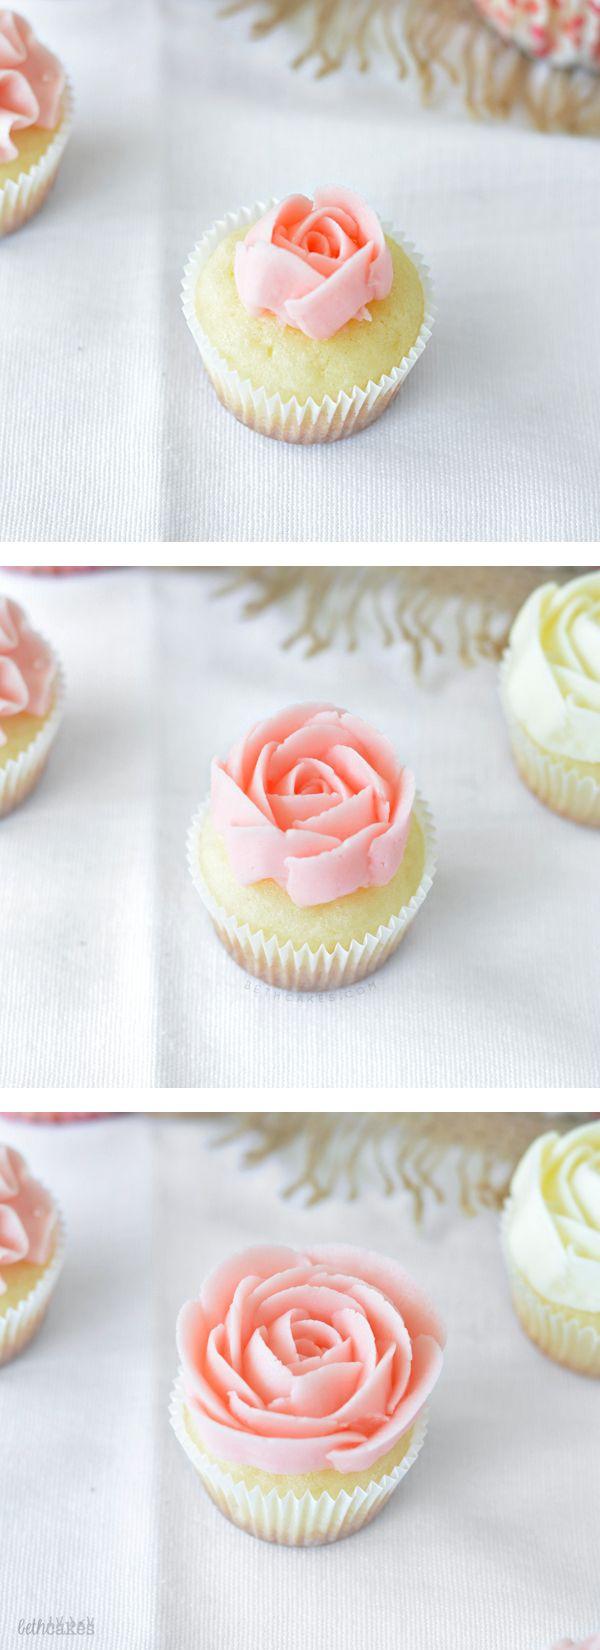 Wedding-themed Rose Cupcakes! bethcakes.com